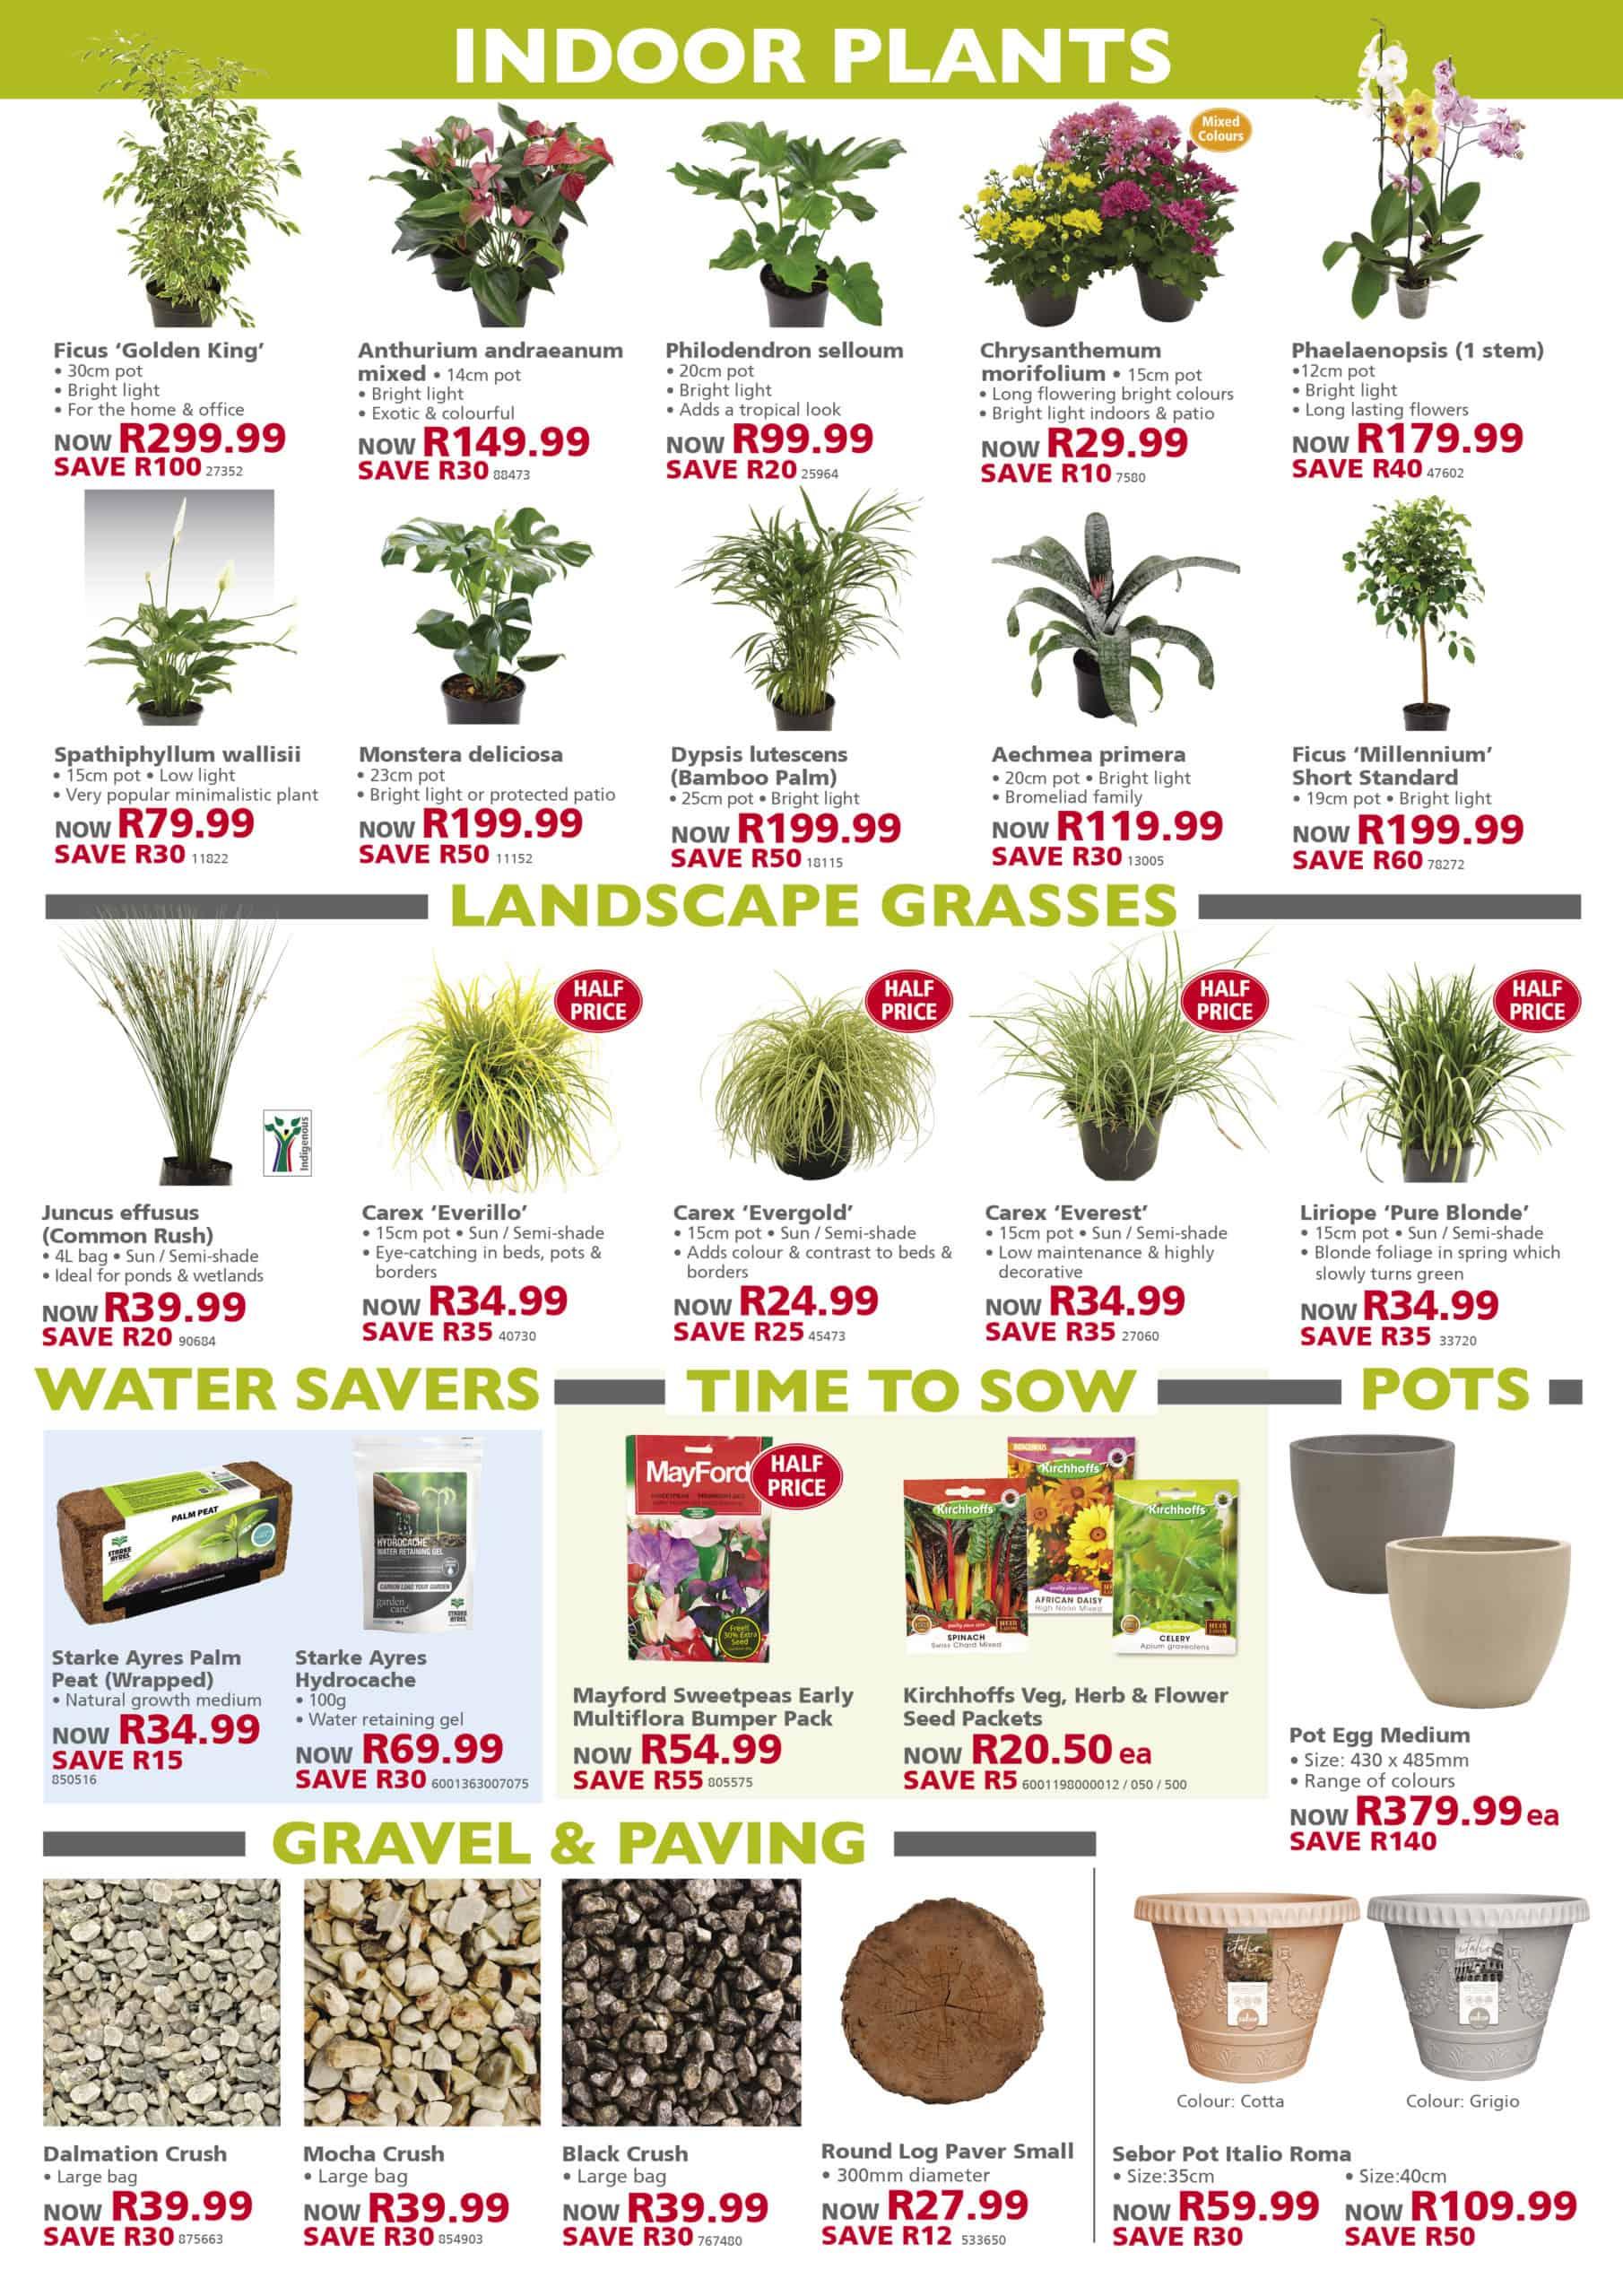 lifestyle home garden specials autumn roses fynbos value garden show competition talborne larger than 2021 march